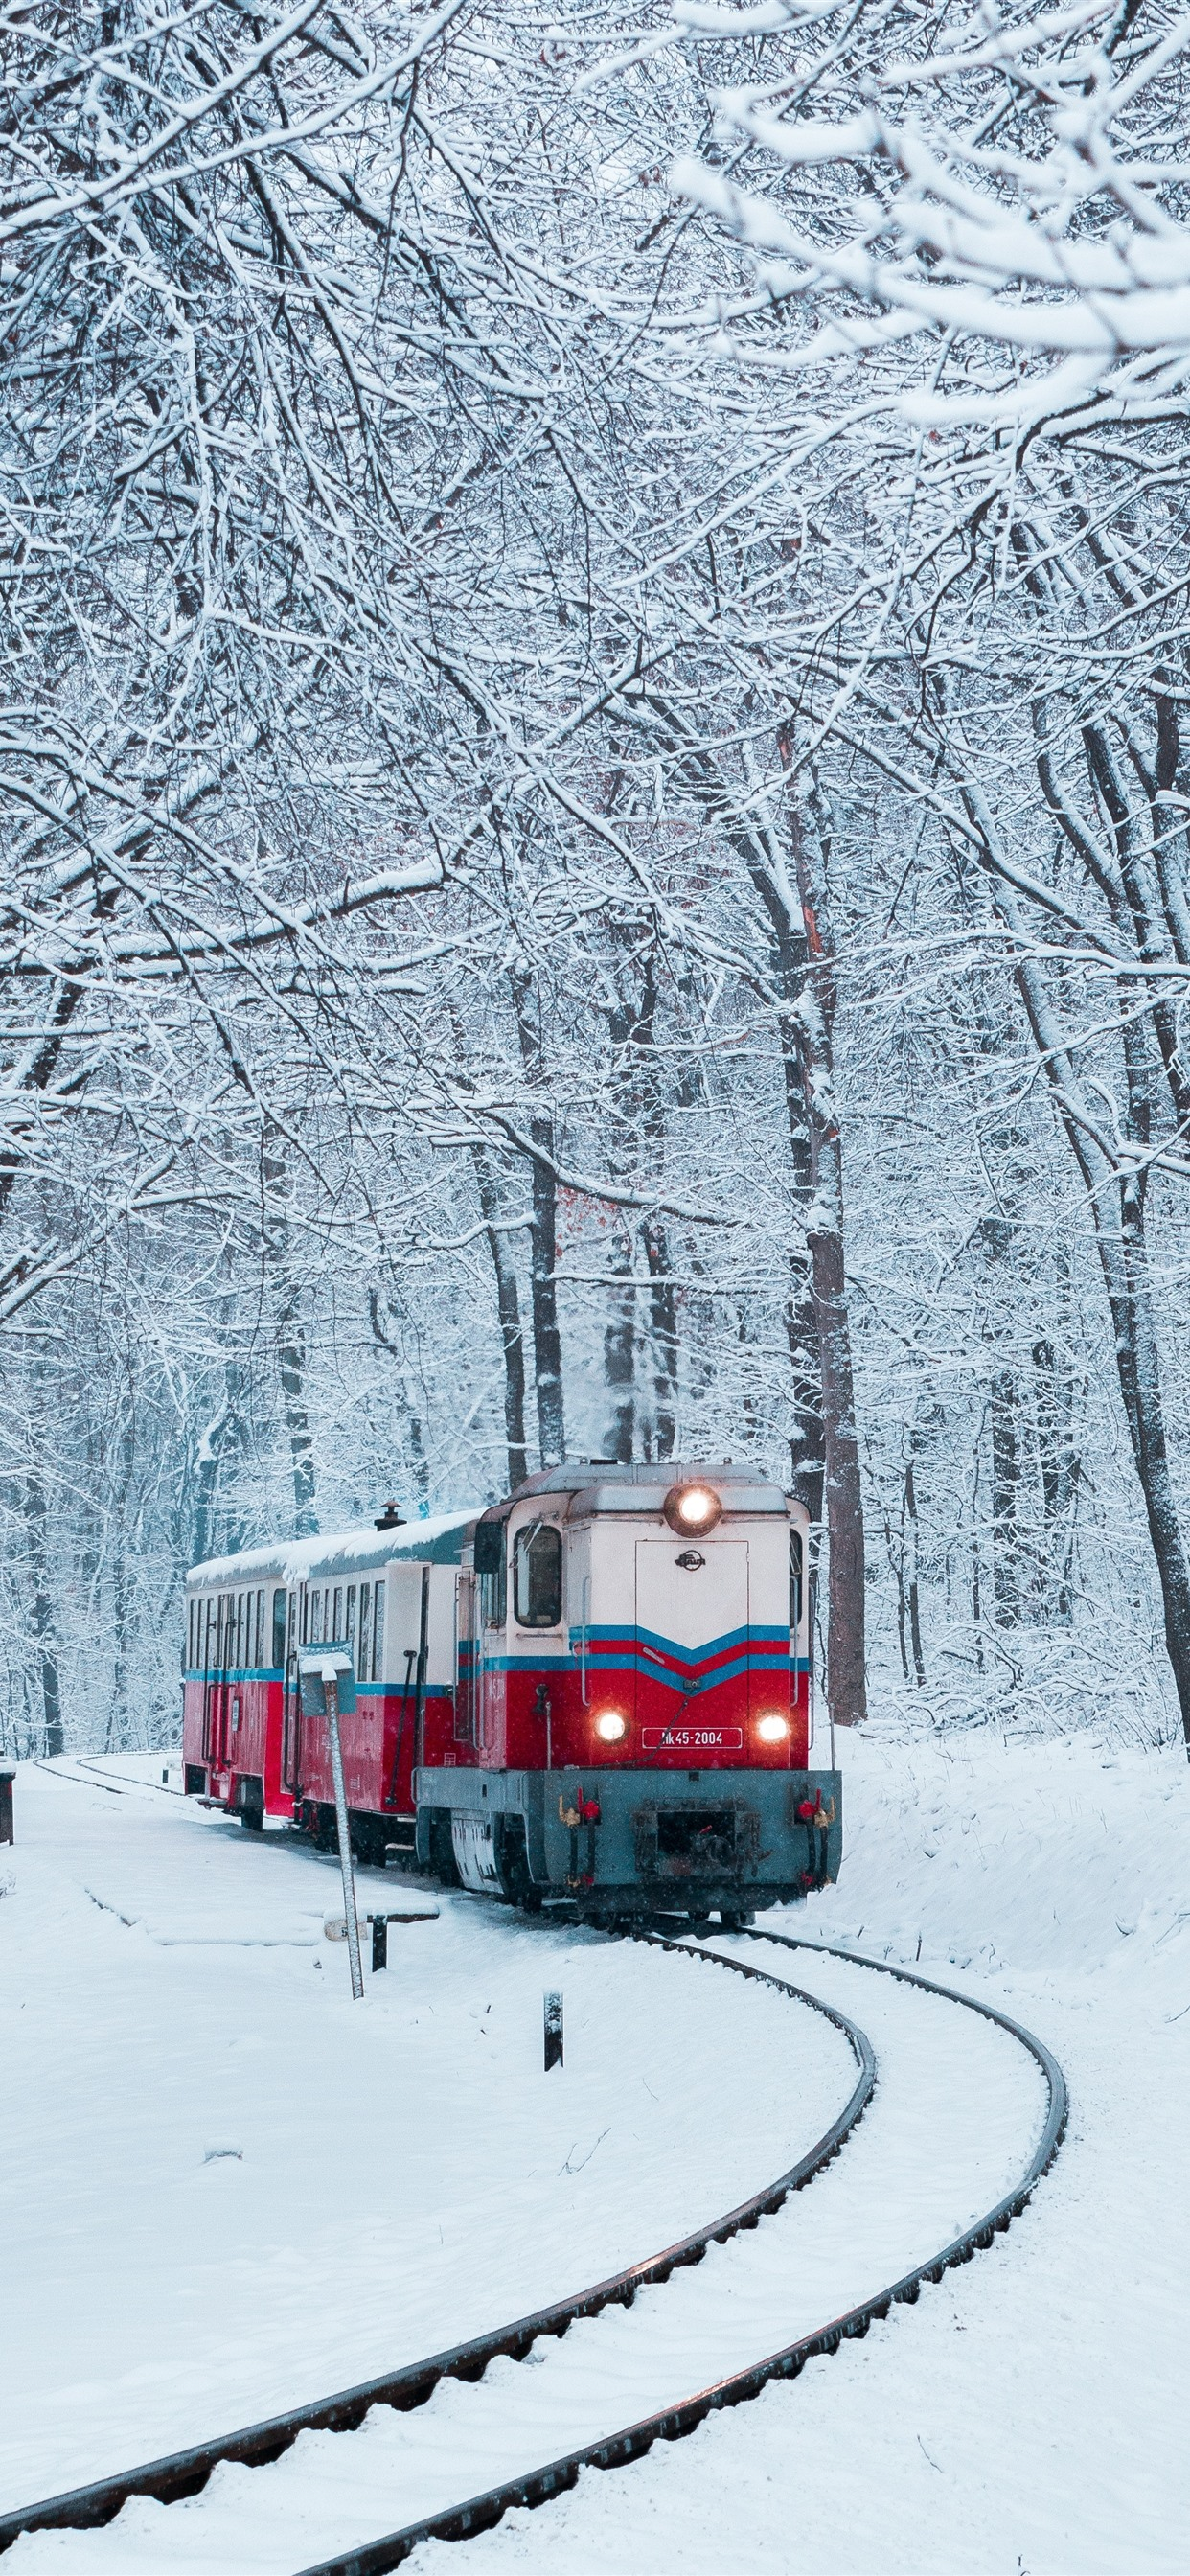 Winter, snow, train, railway, trees ...